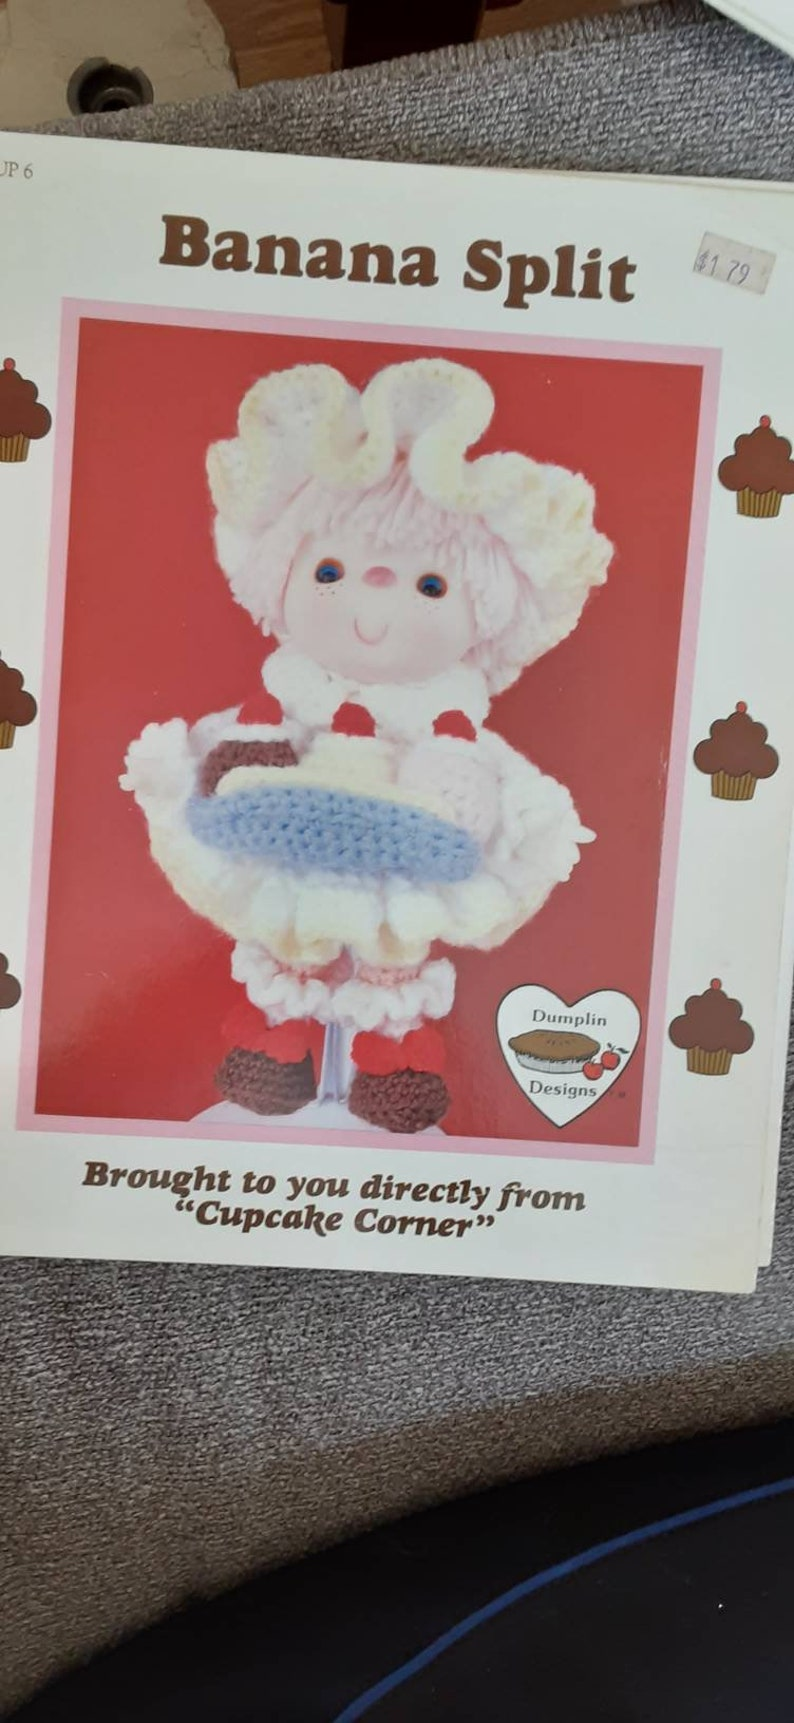 DUMPLIN DESIGNS Cupcake Corner Crochet Leaflet c1985  Free Shipping Banana Split Doll Outfit to Crochet